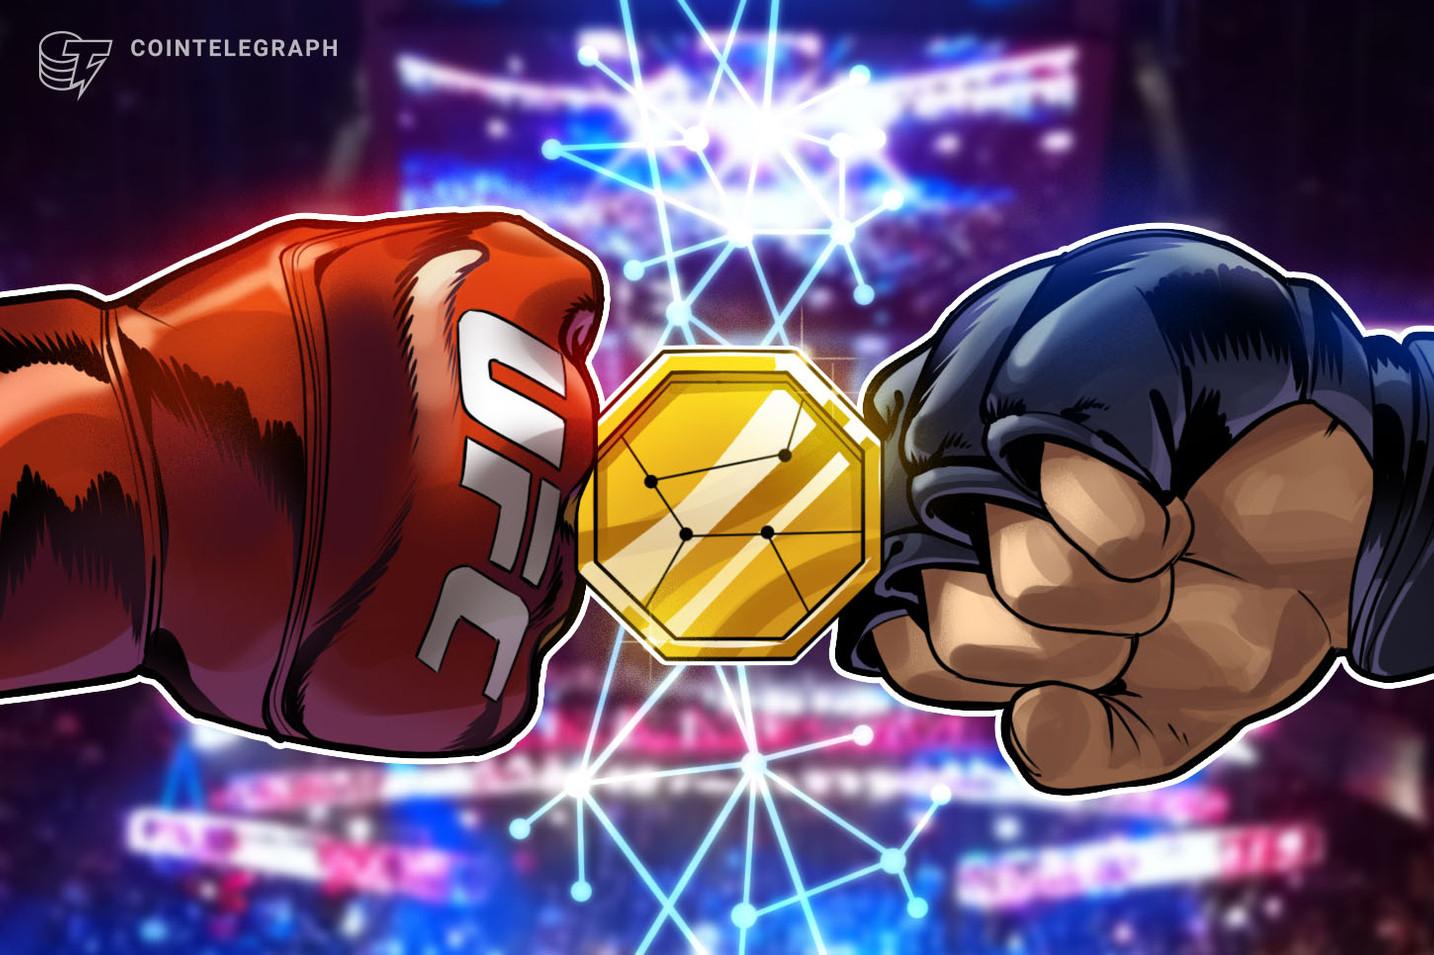 أبرمت UFC صفقة رعاية بقيمة 175 مليون دولار مع Crypto.com